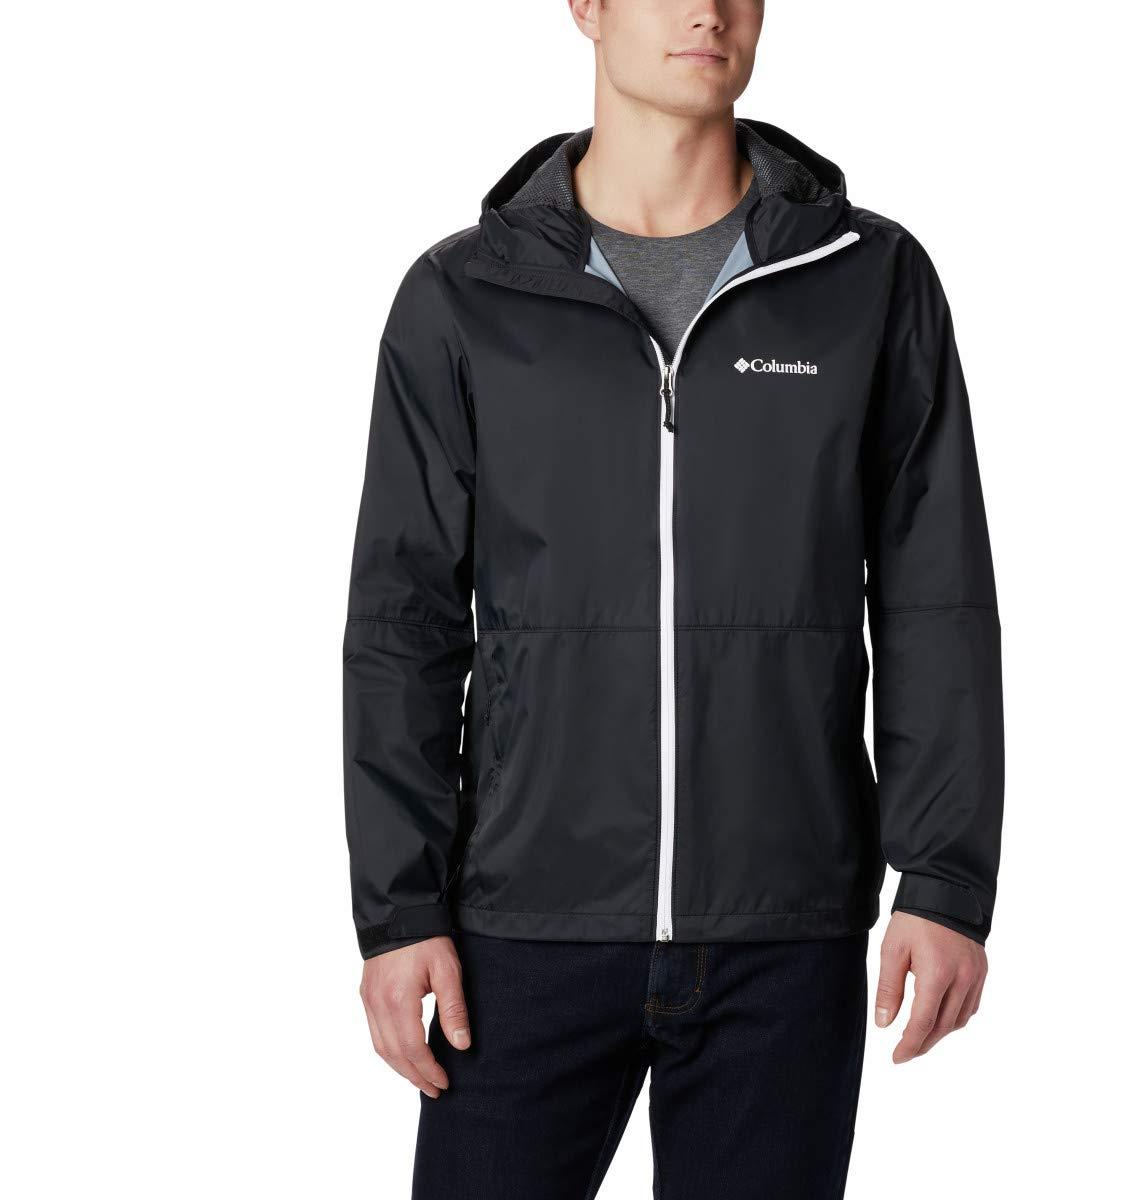 Columbia Men's Roan Mountain Jacket, Black/White, Large by Columbia